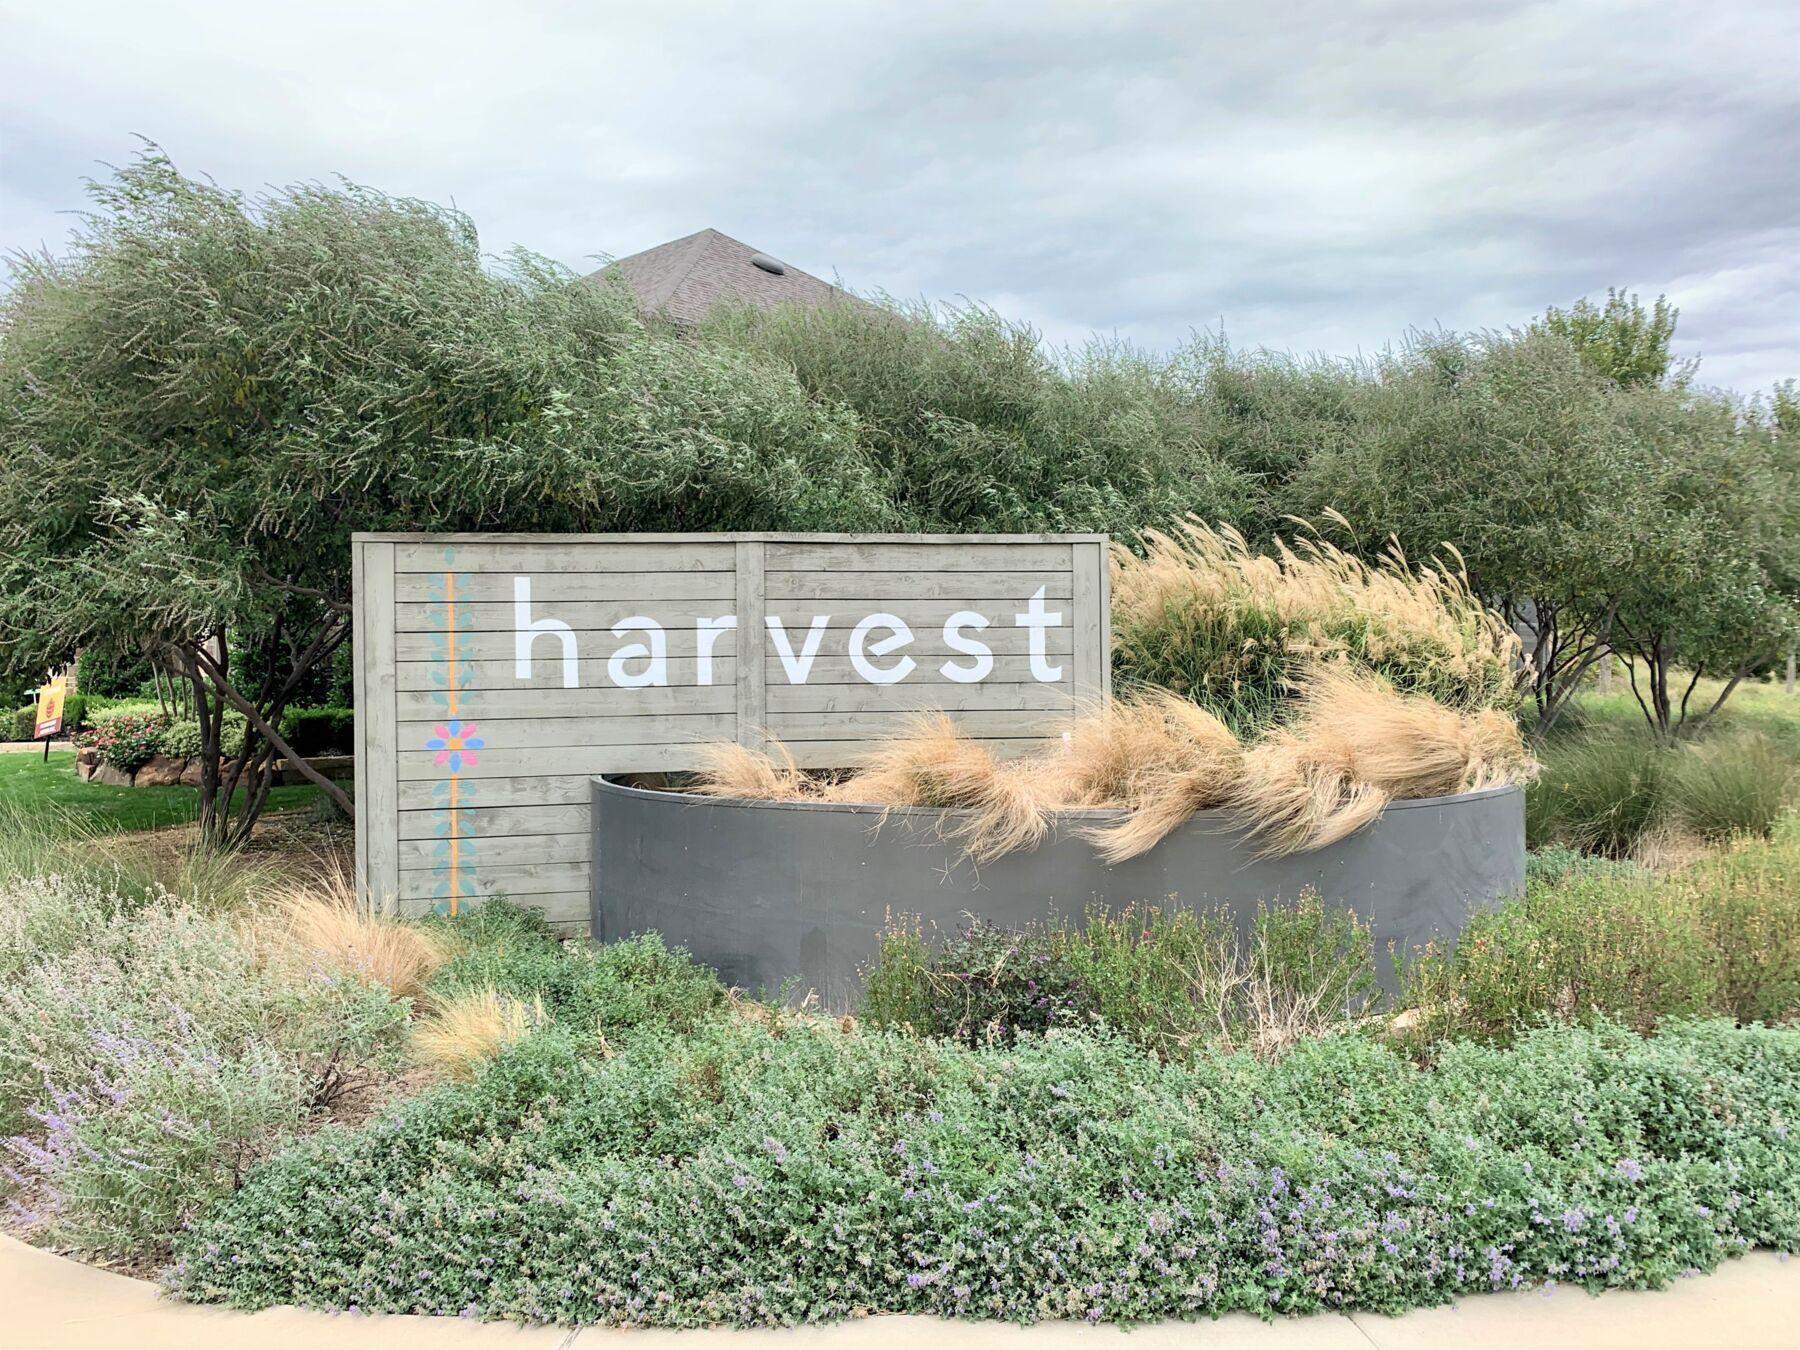 Harvest Community Entrance